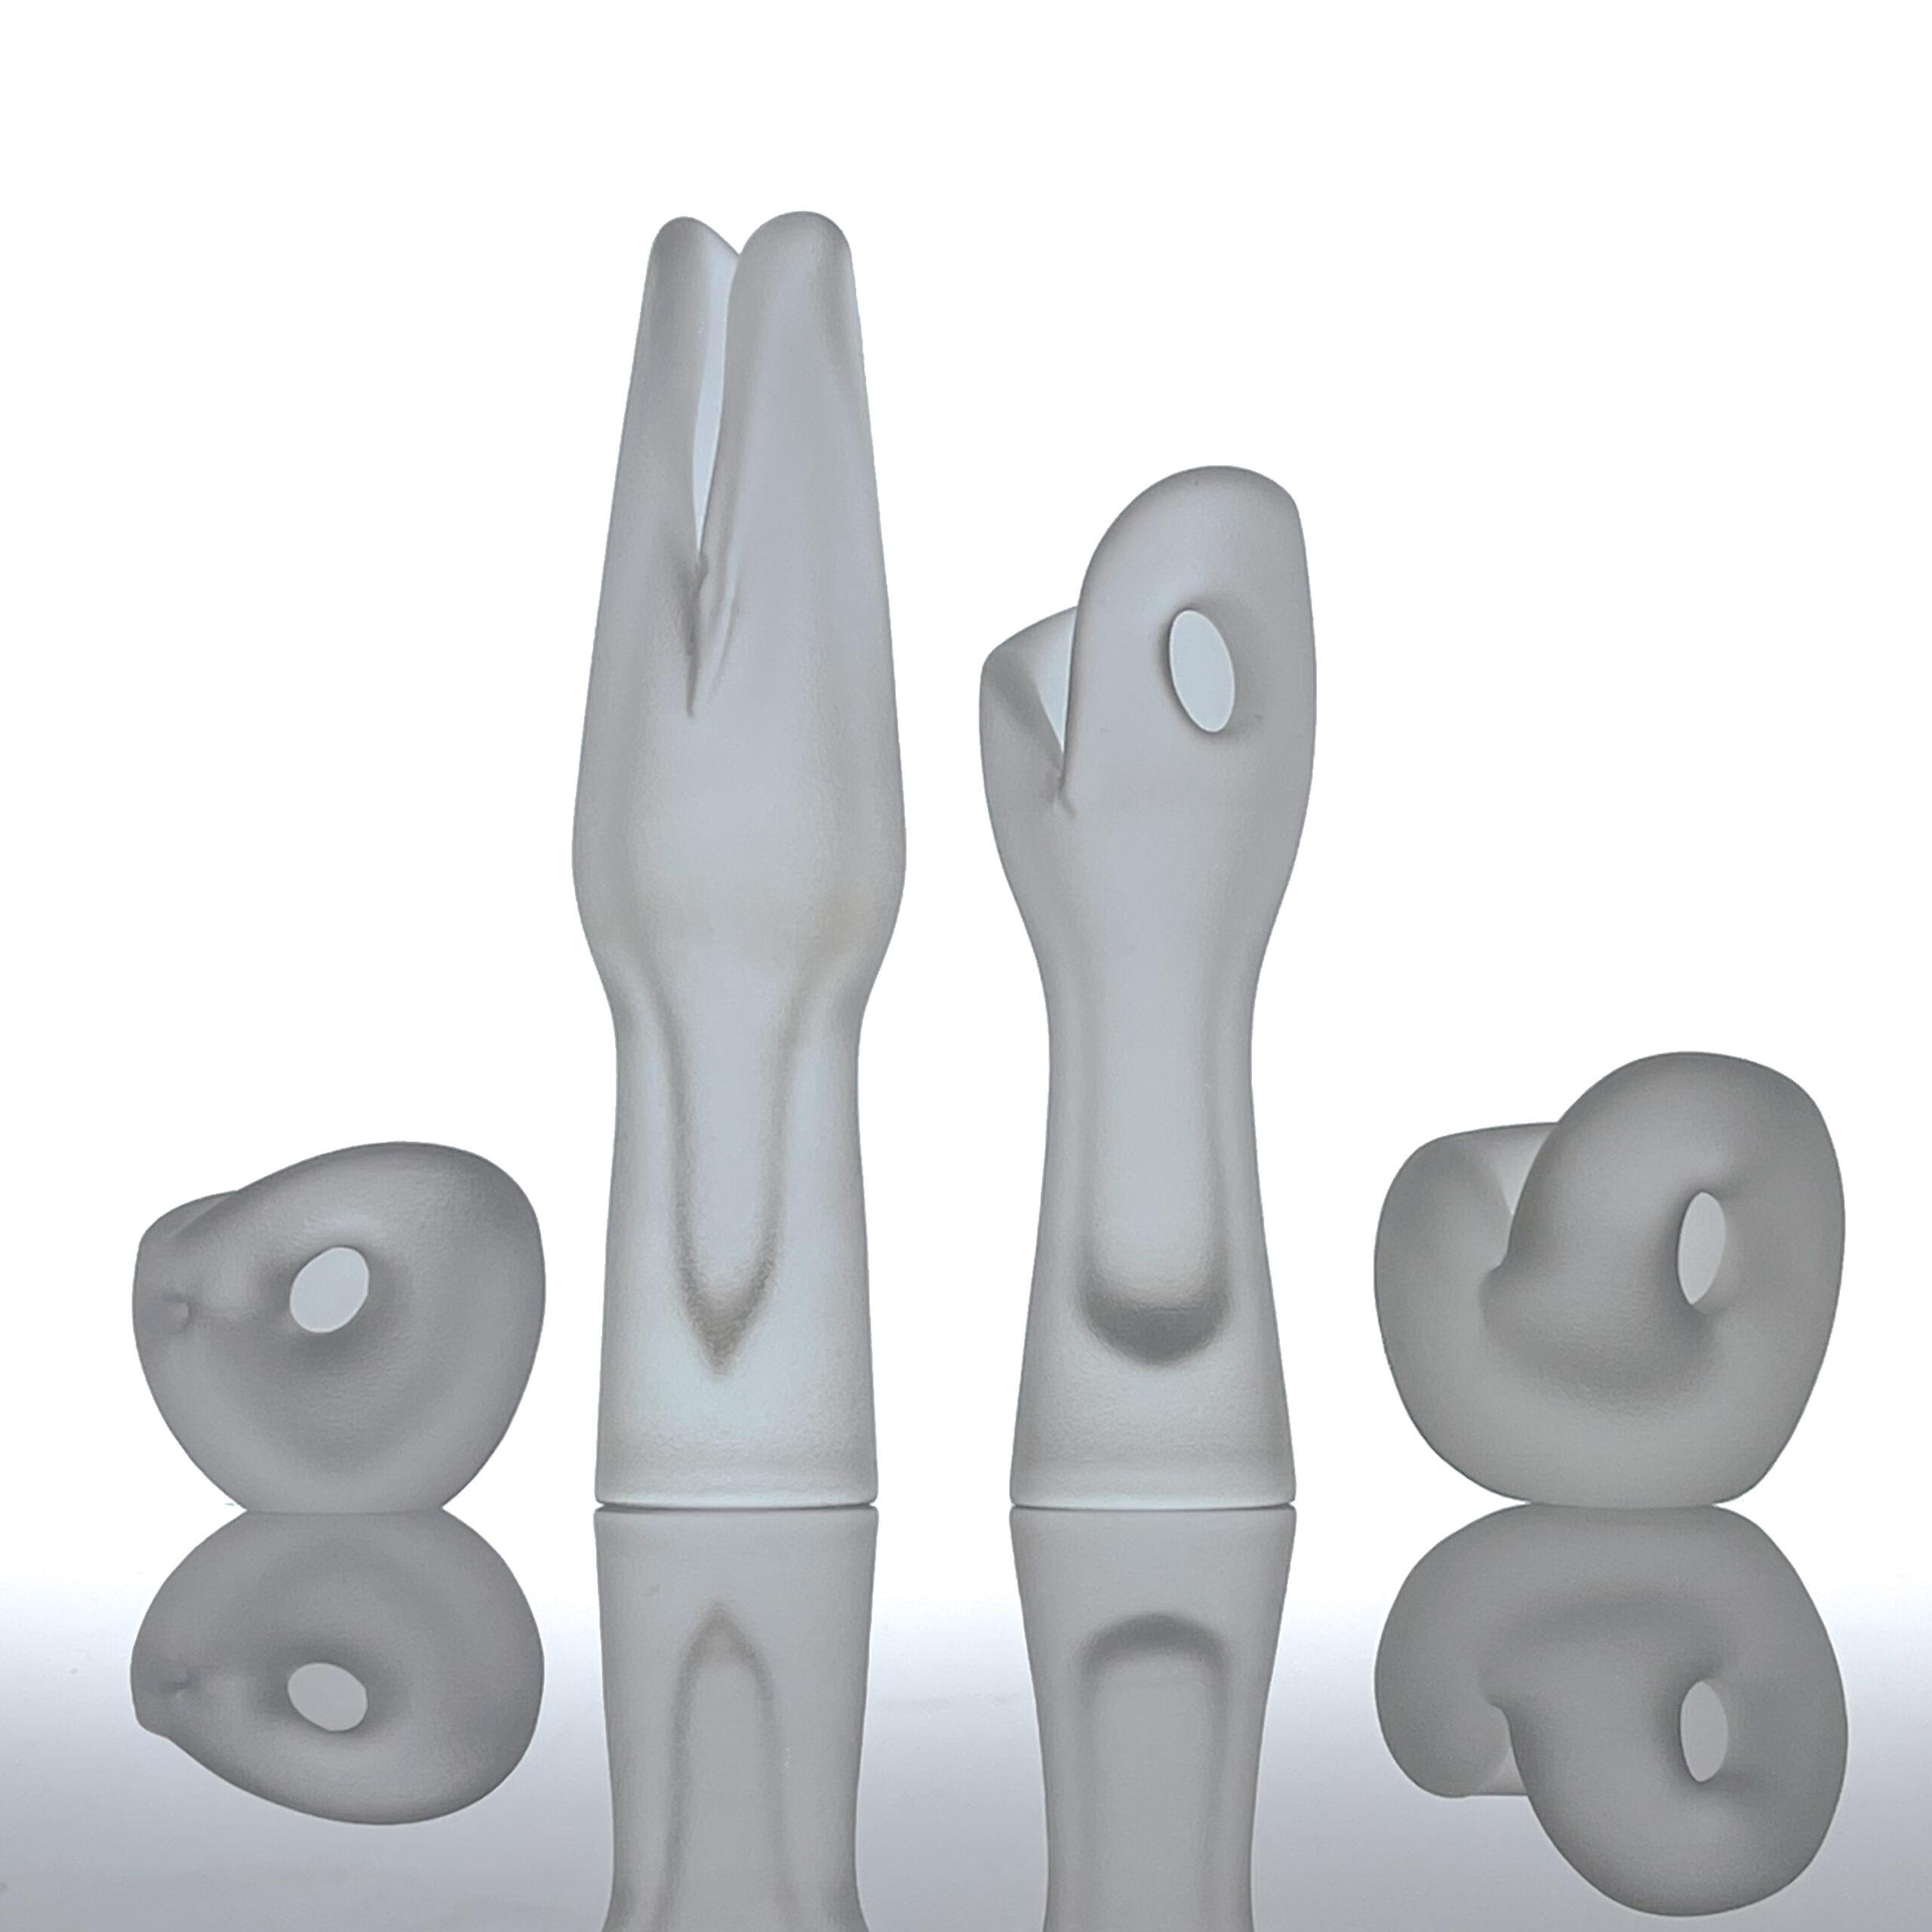 TS Matted sculptures web-1